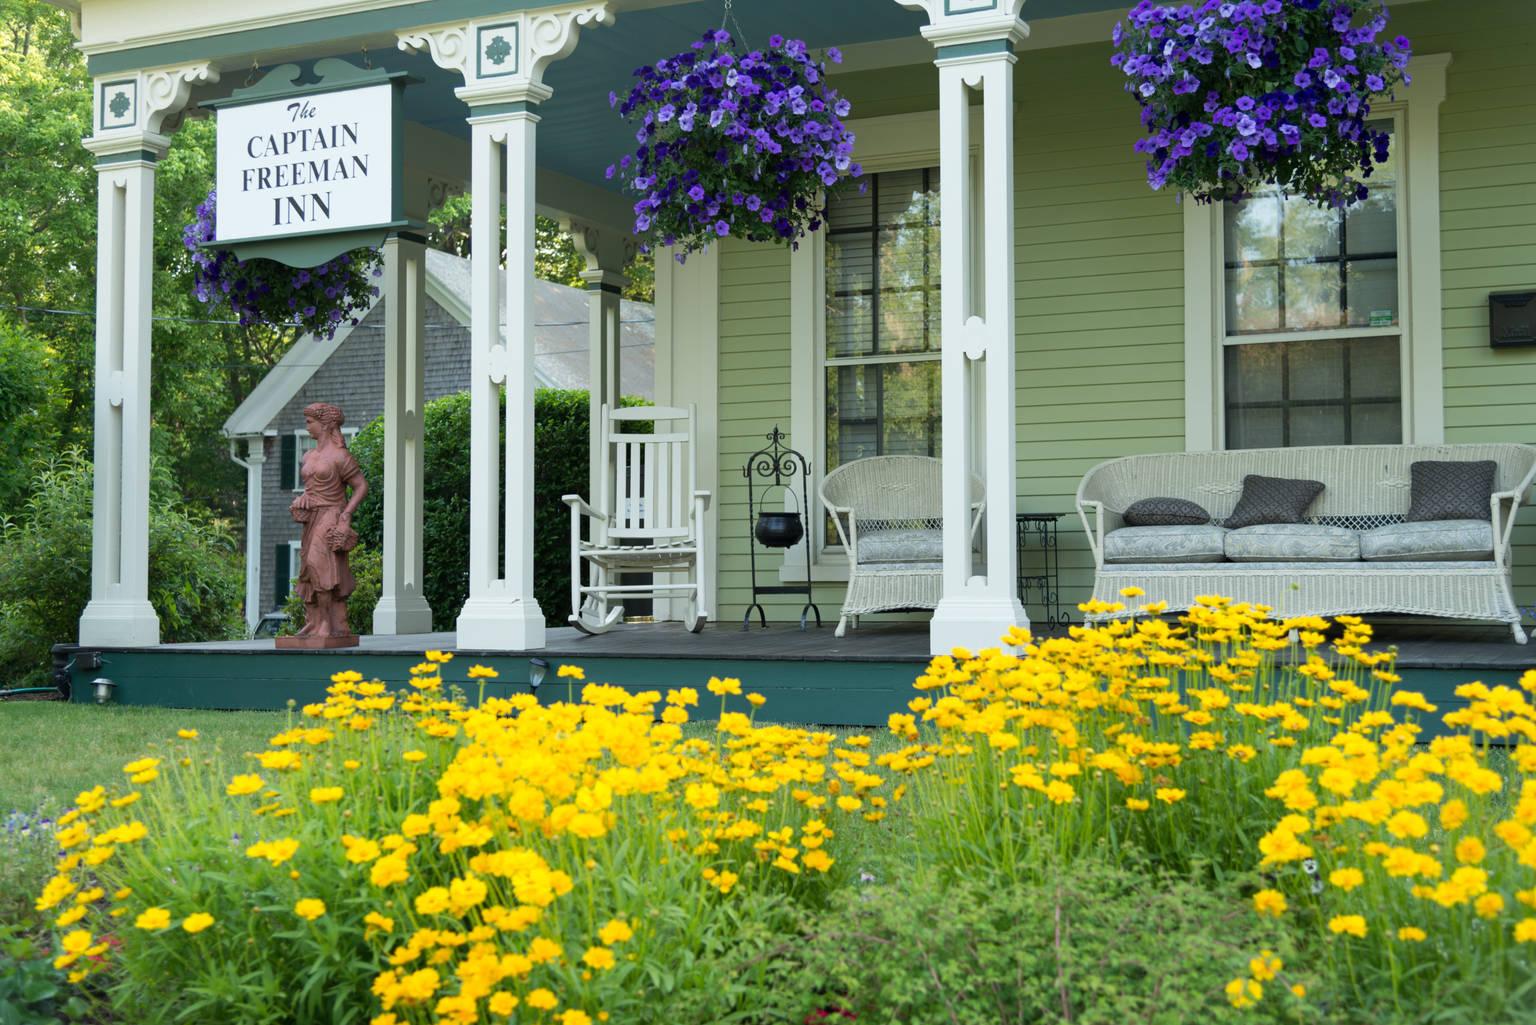 A yellow flower at Captain Freeman Inn.